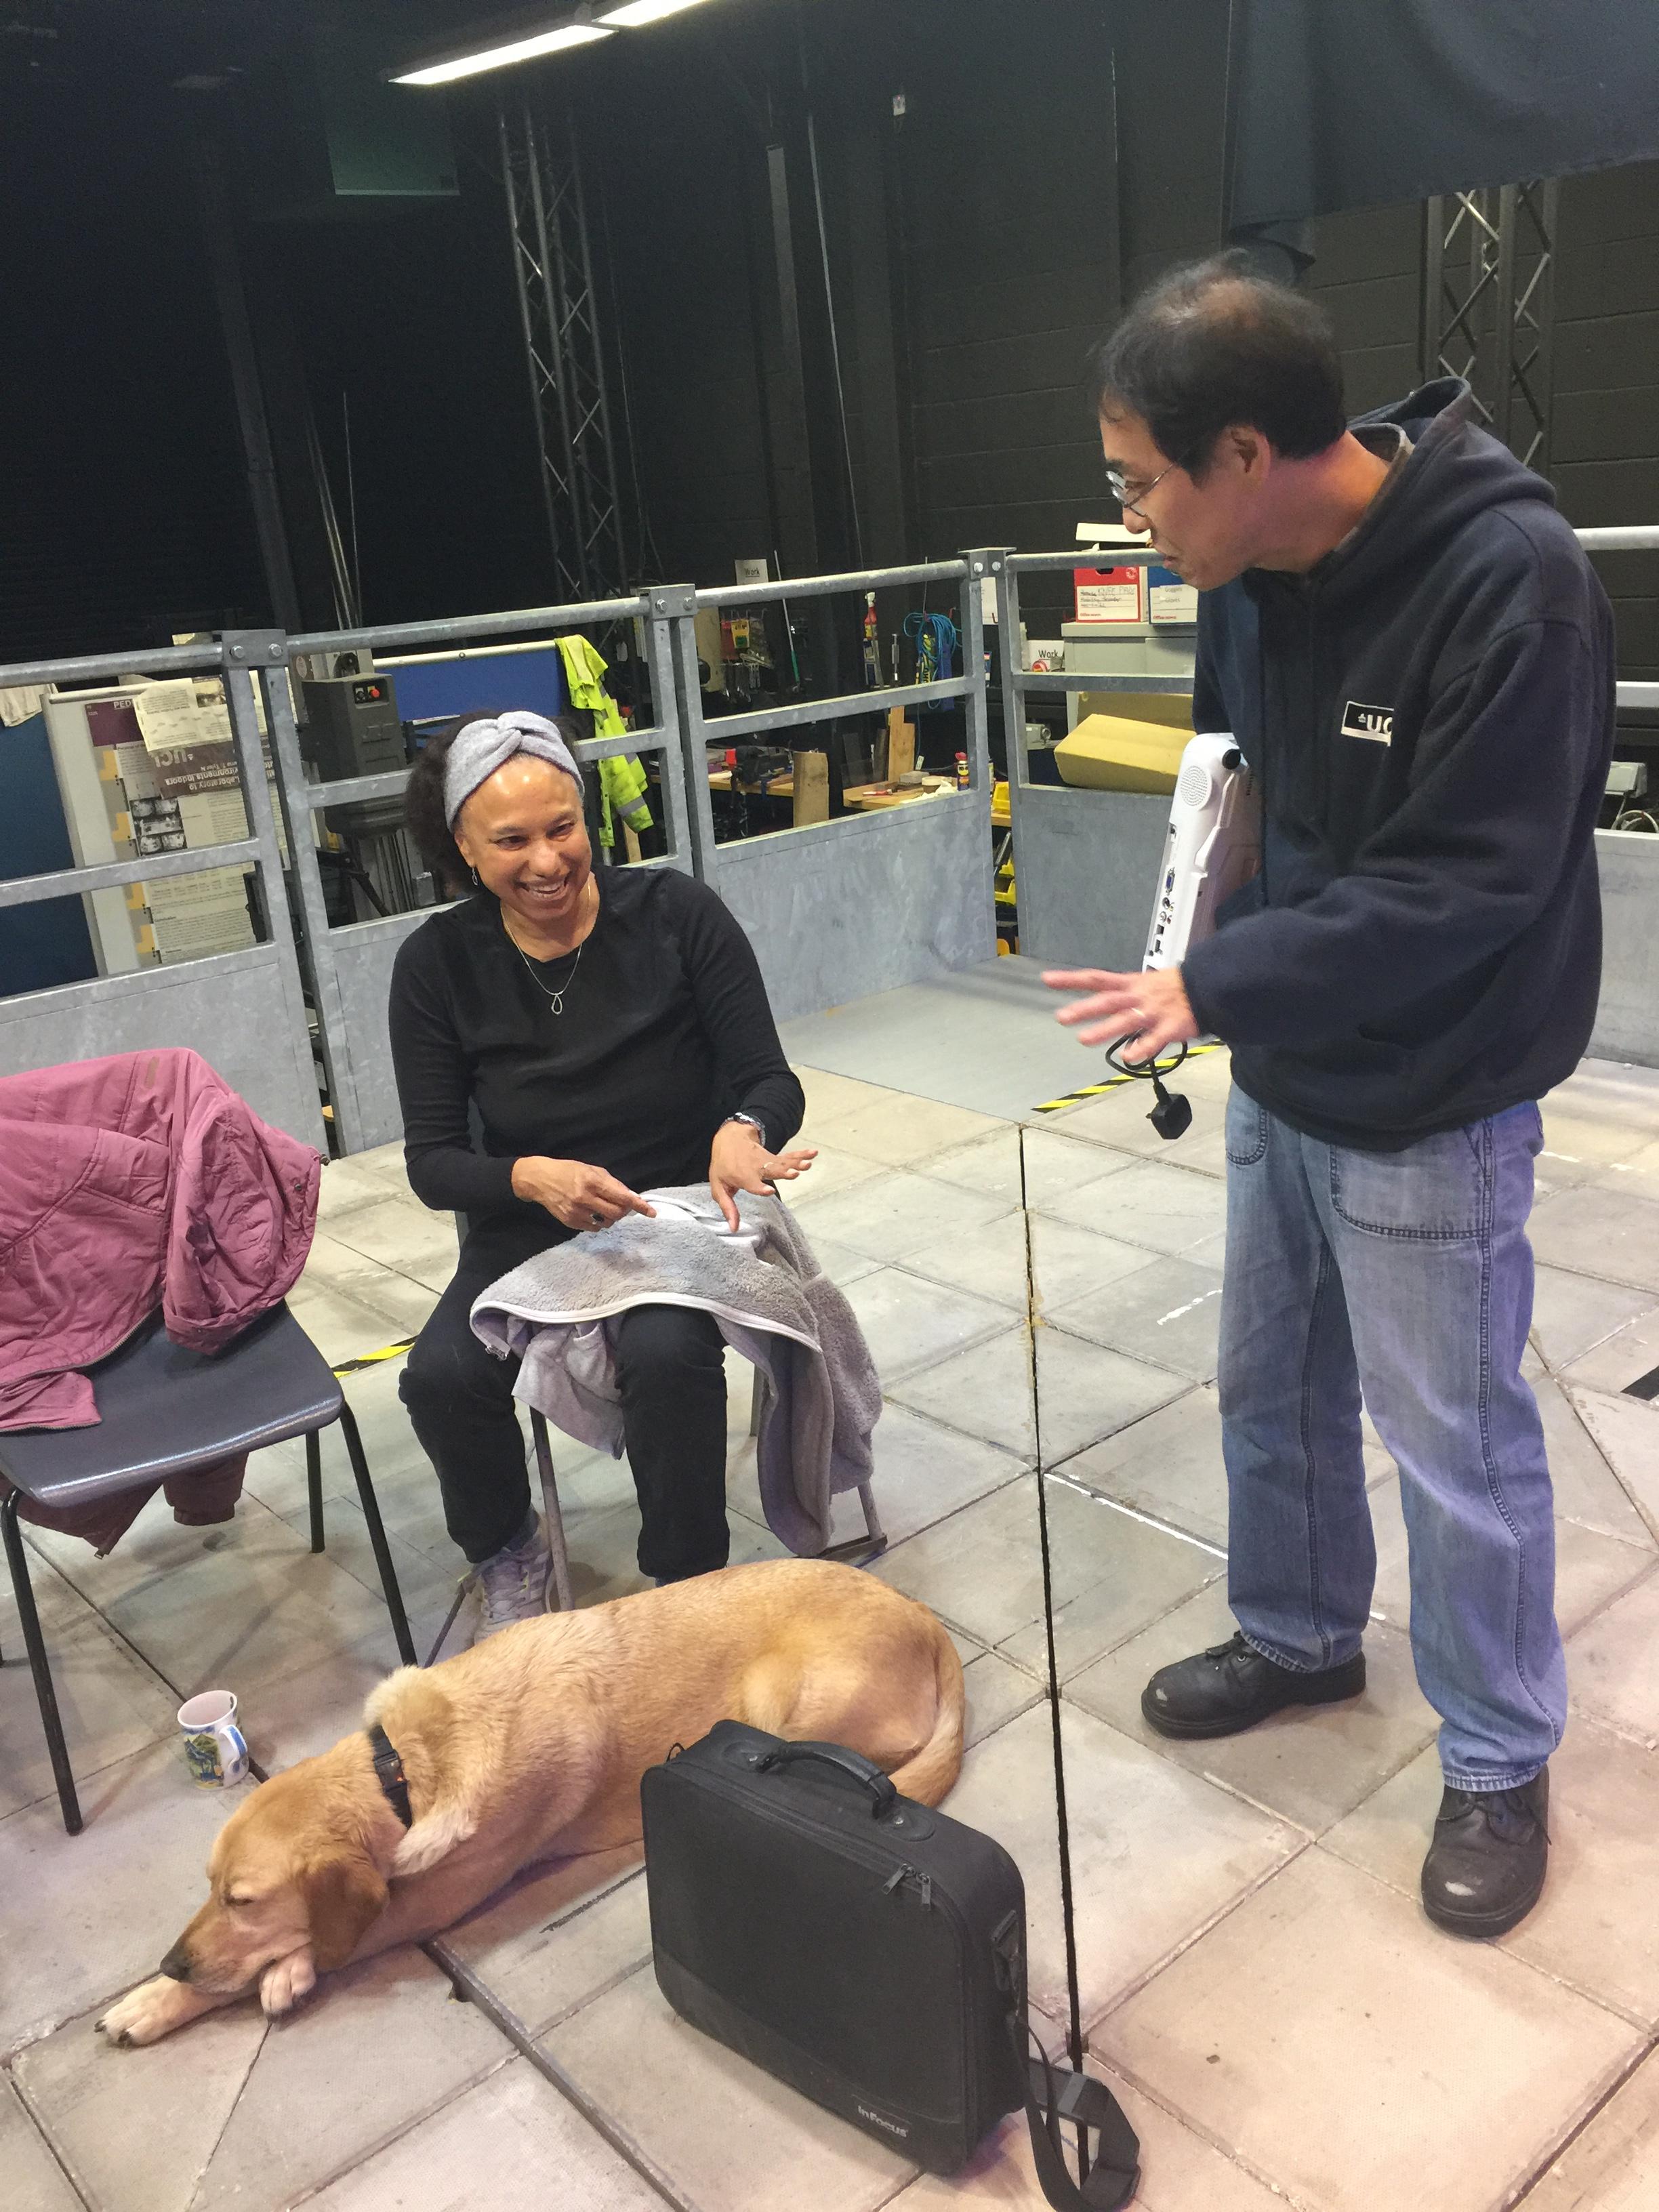 PAMELA technician Tatsuto Suzuki offers a projector to Maria, sitting on platform laughing